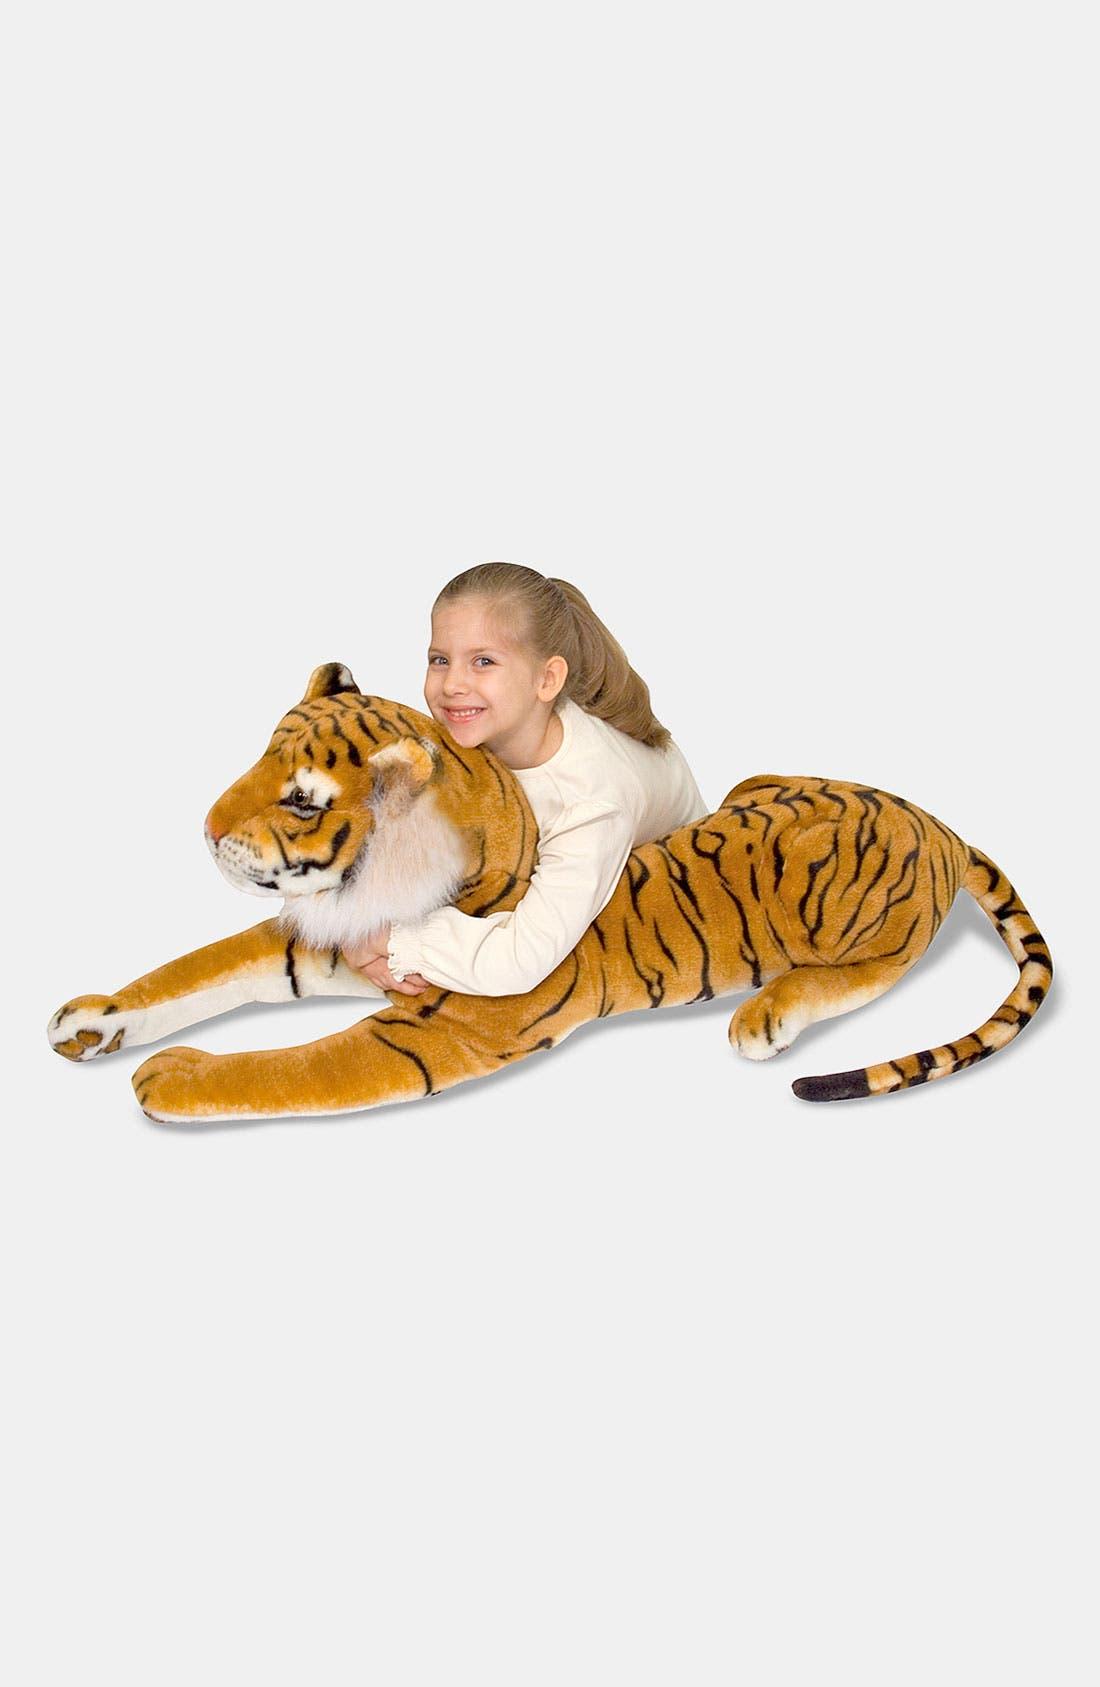 Alternate Image 1 Selected - Melissa & Doug Oversized Tiger